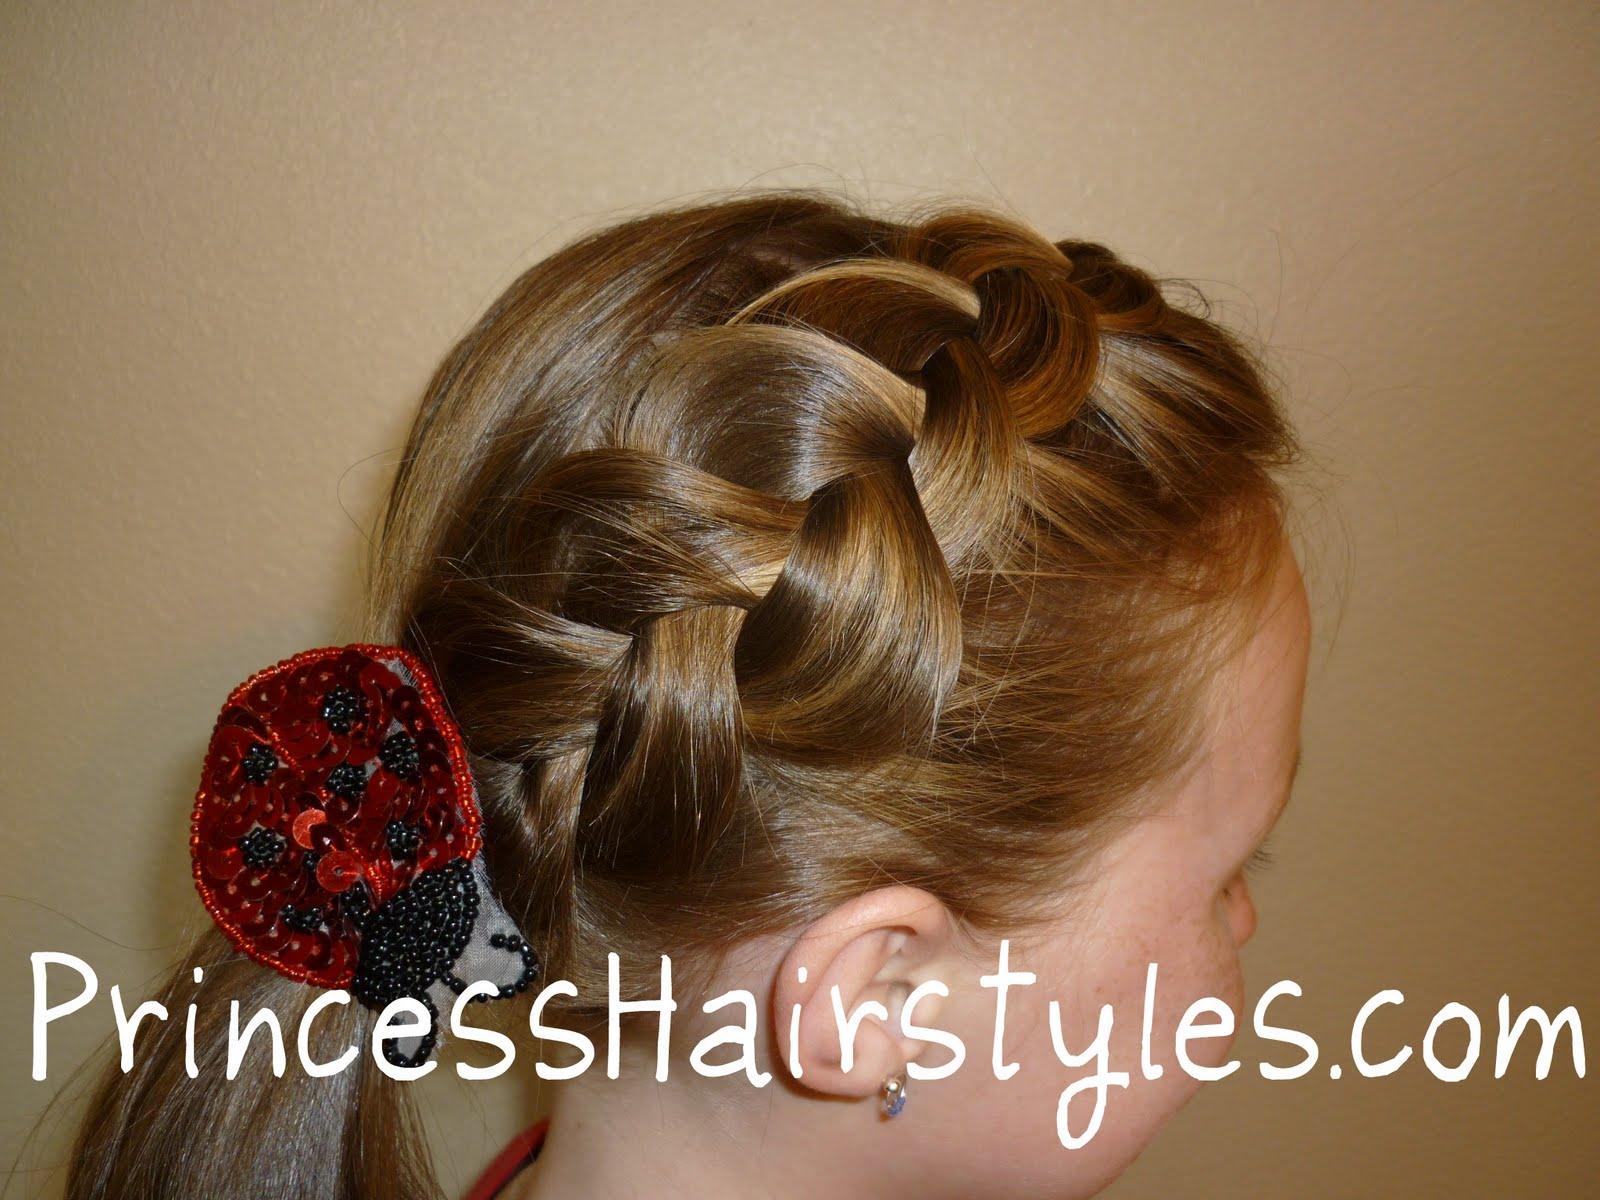 Strange Loose French Braid Hairstyle Hairstyles For Girls Princess Short Hairstyles Gunalazisus